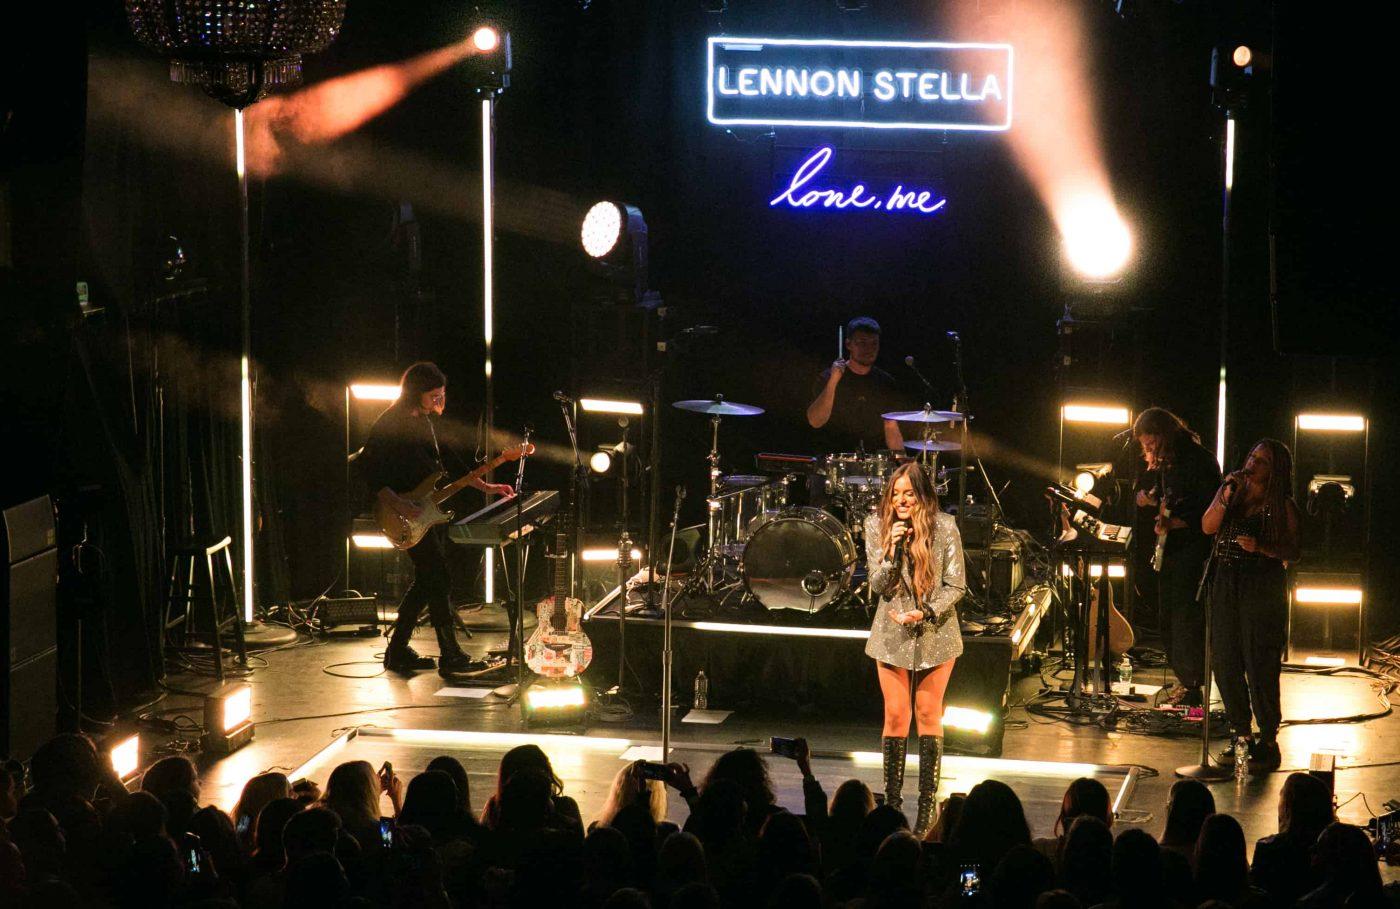 Lennon Stella at Irving Plaza by Kristen Cusumano